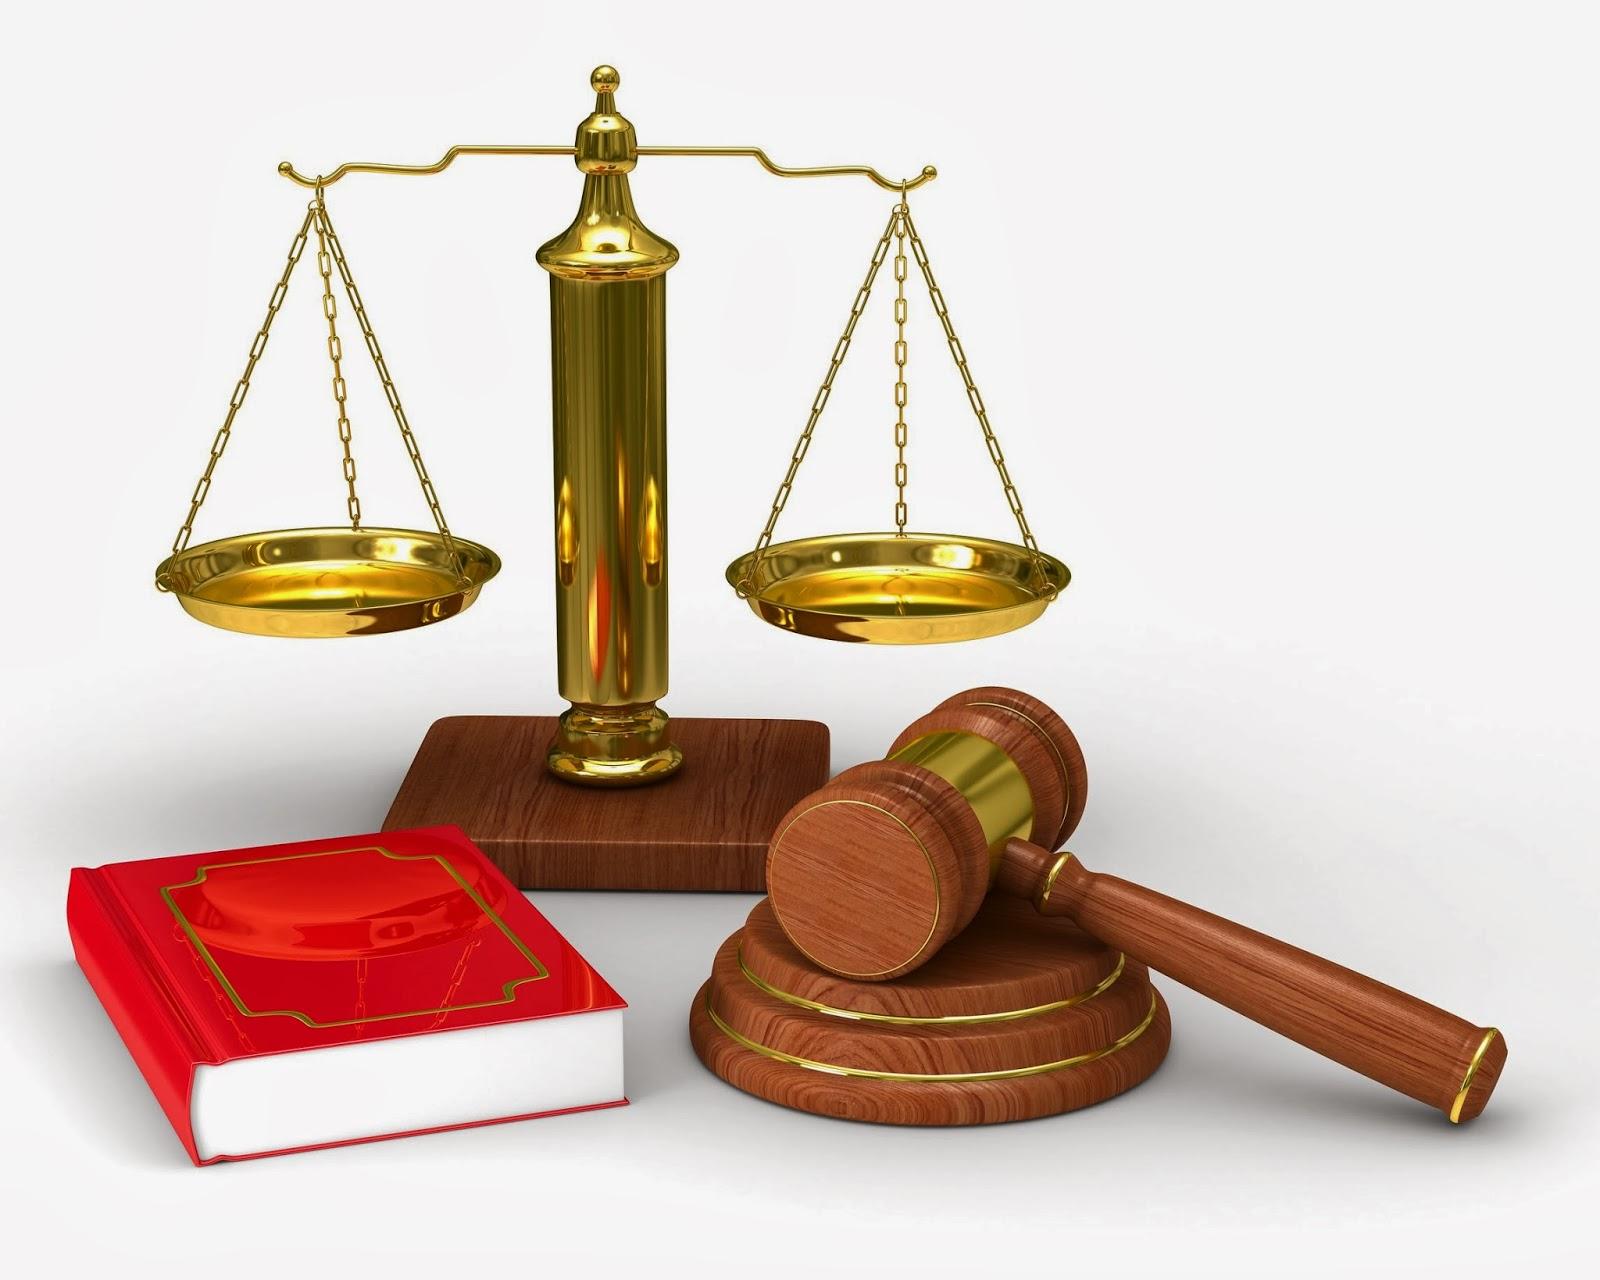 Pengertian Dan Contoh Hak Dan Kewajiban Warga Negara Menurut Uud